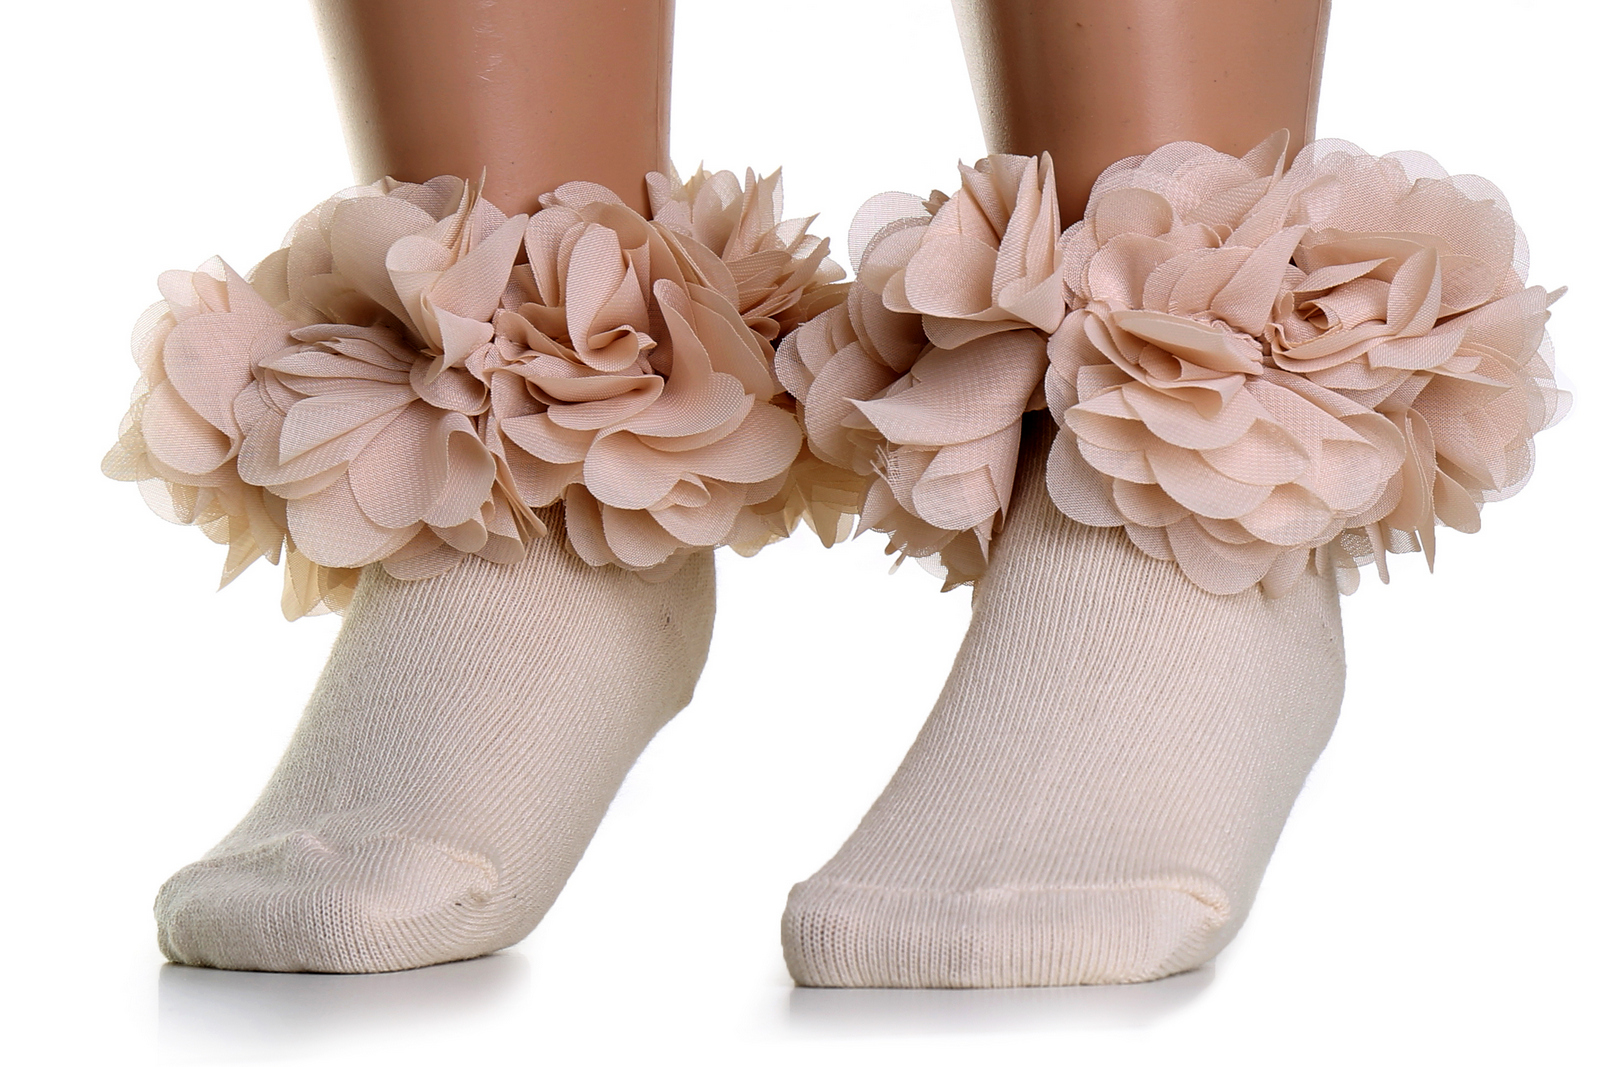 Socks photography (1)